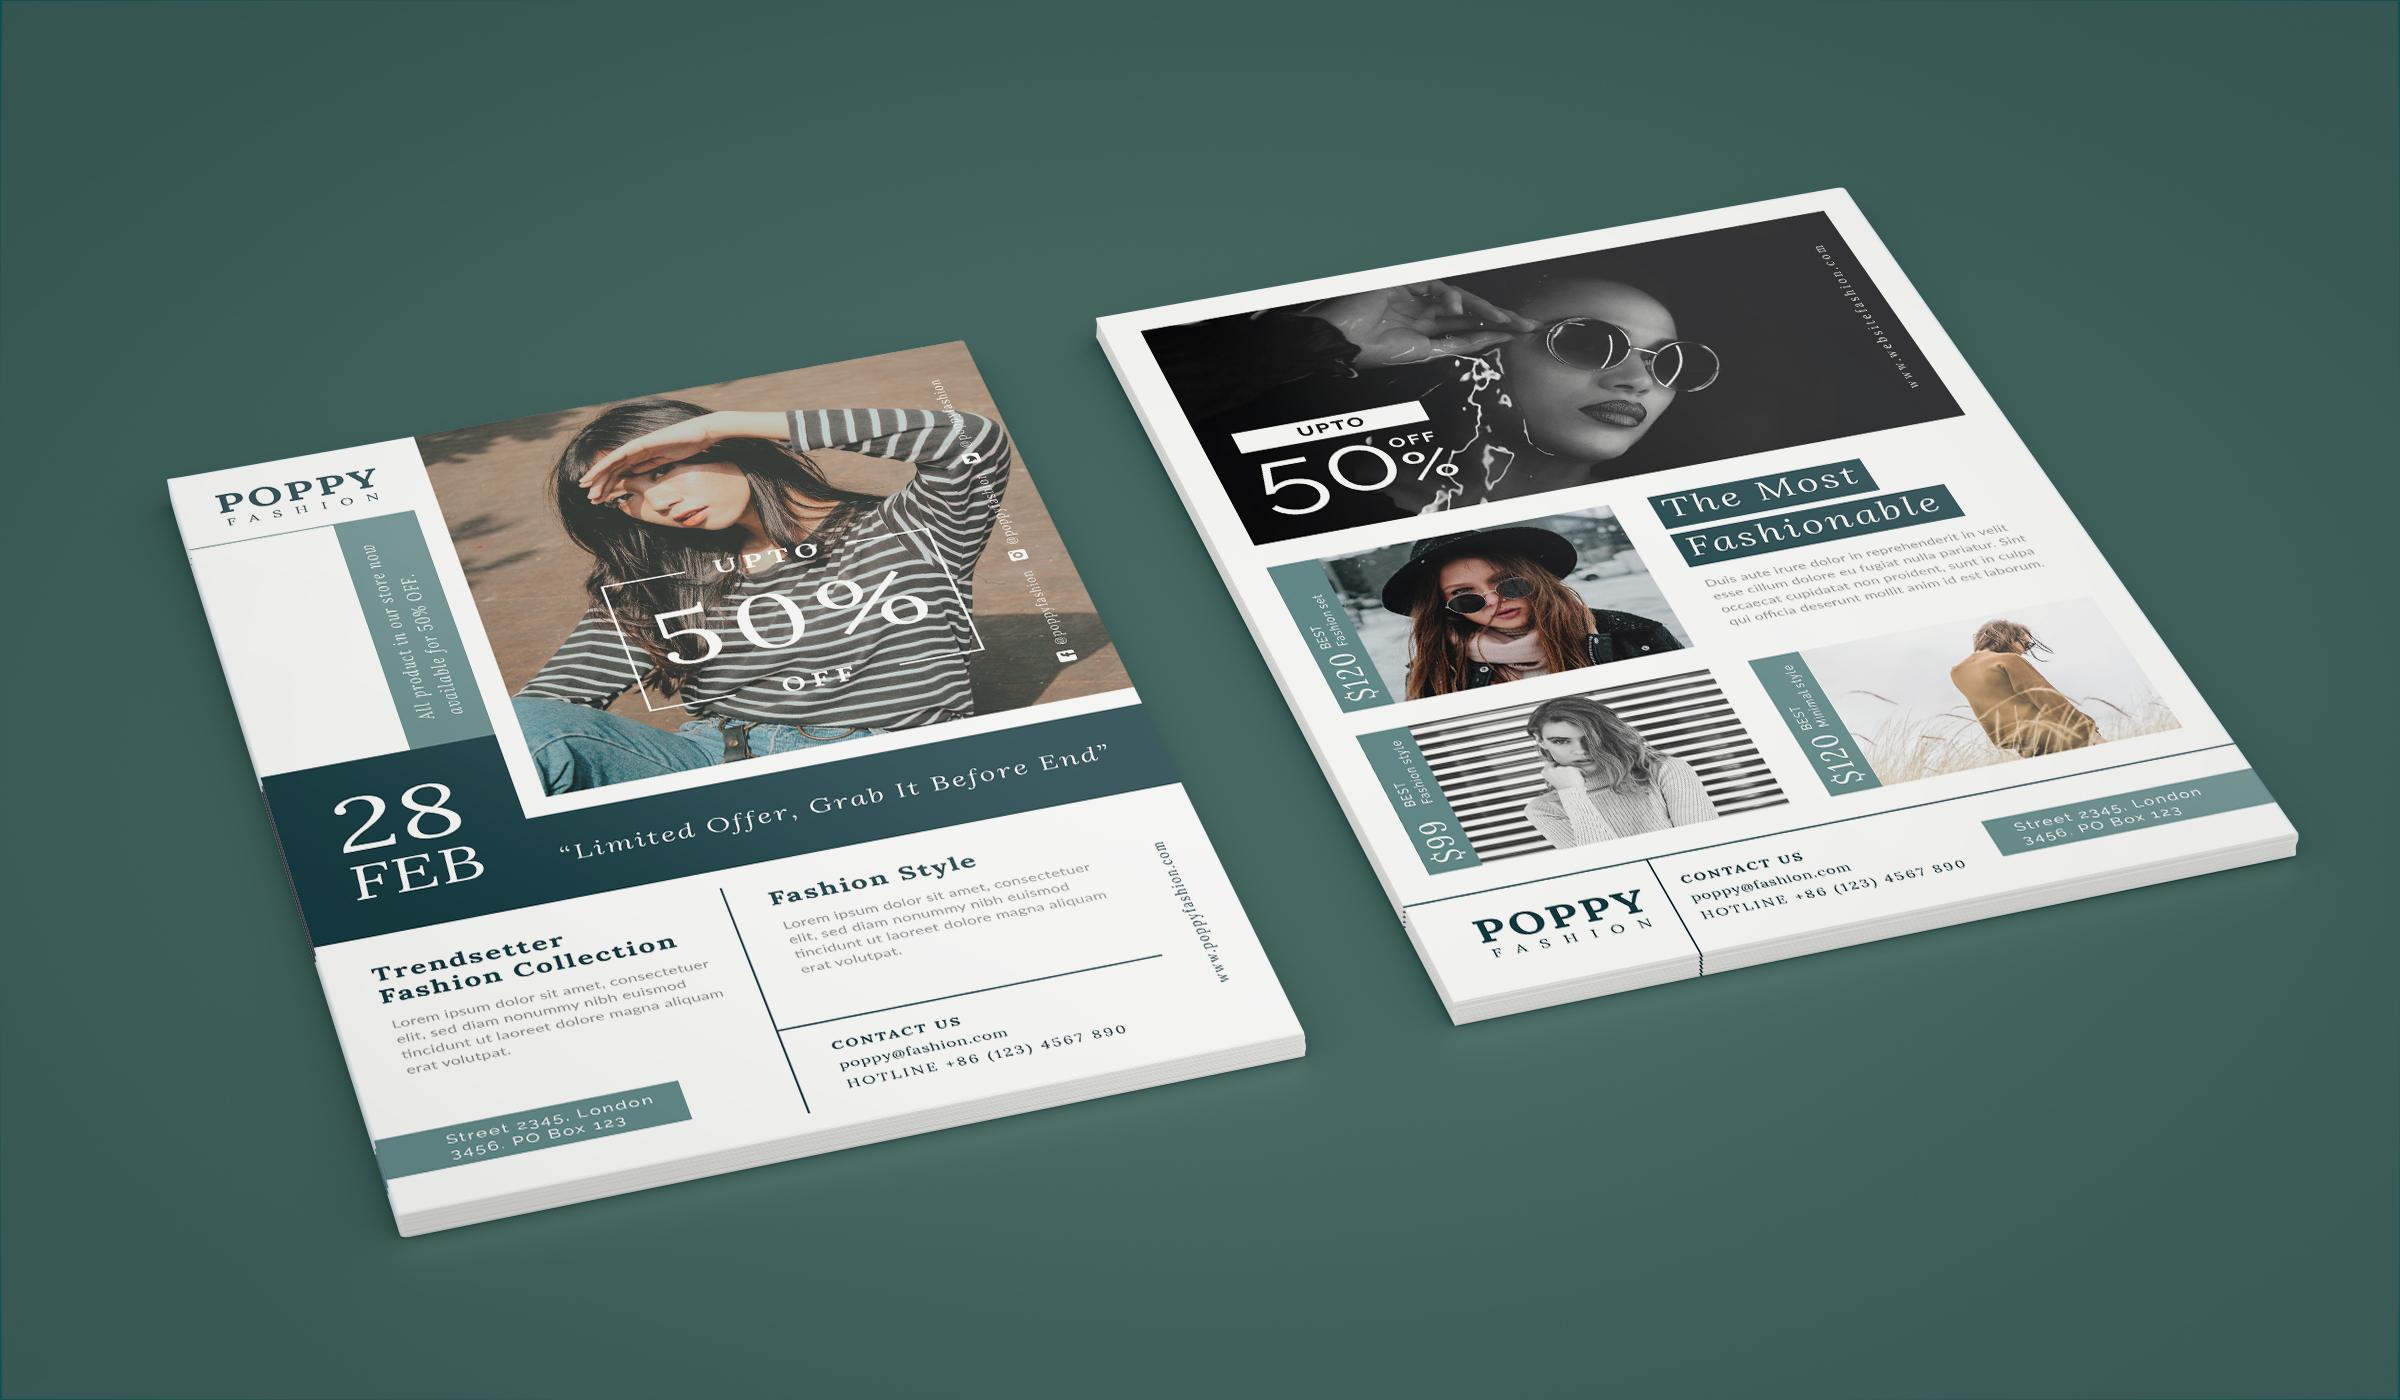 Poppy - Fashion flyer example image 2